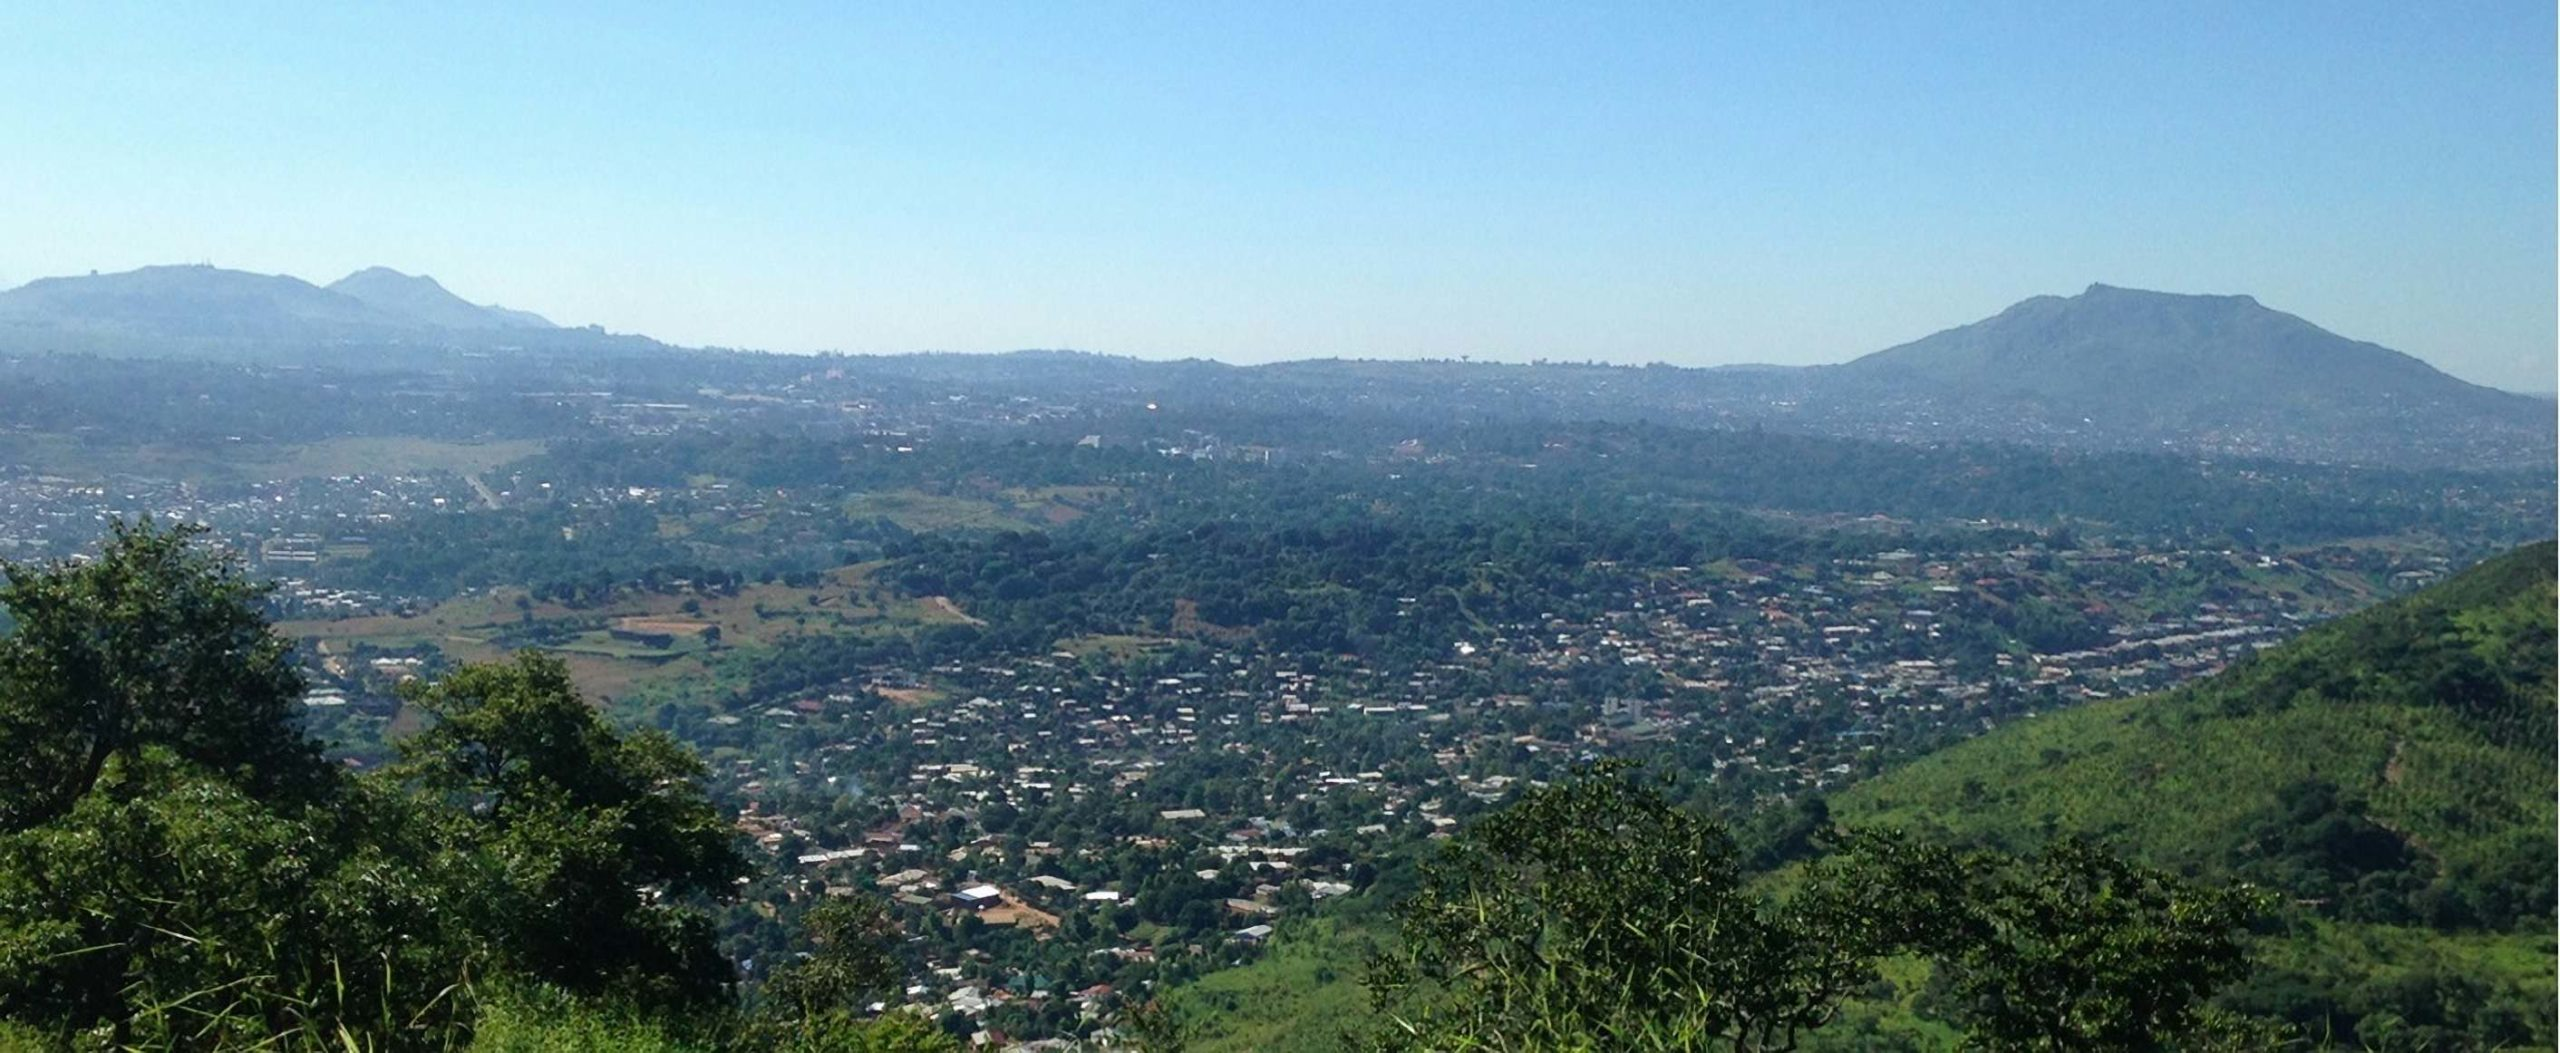 Chilomoni Malawi